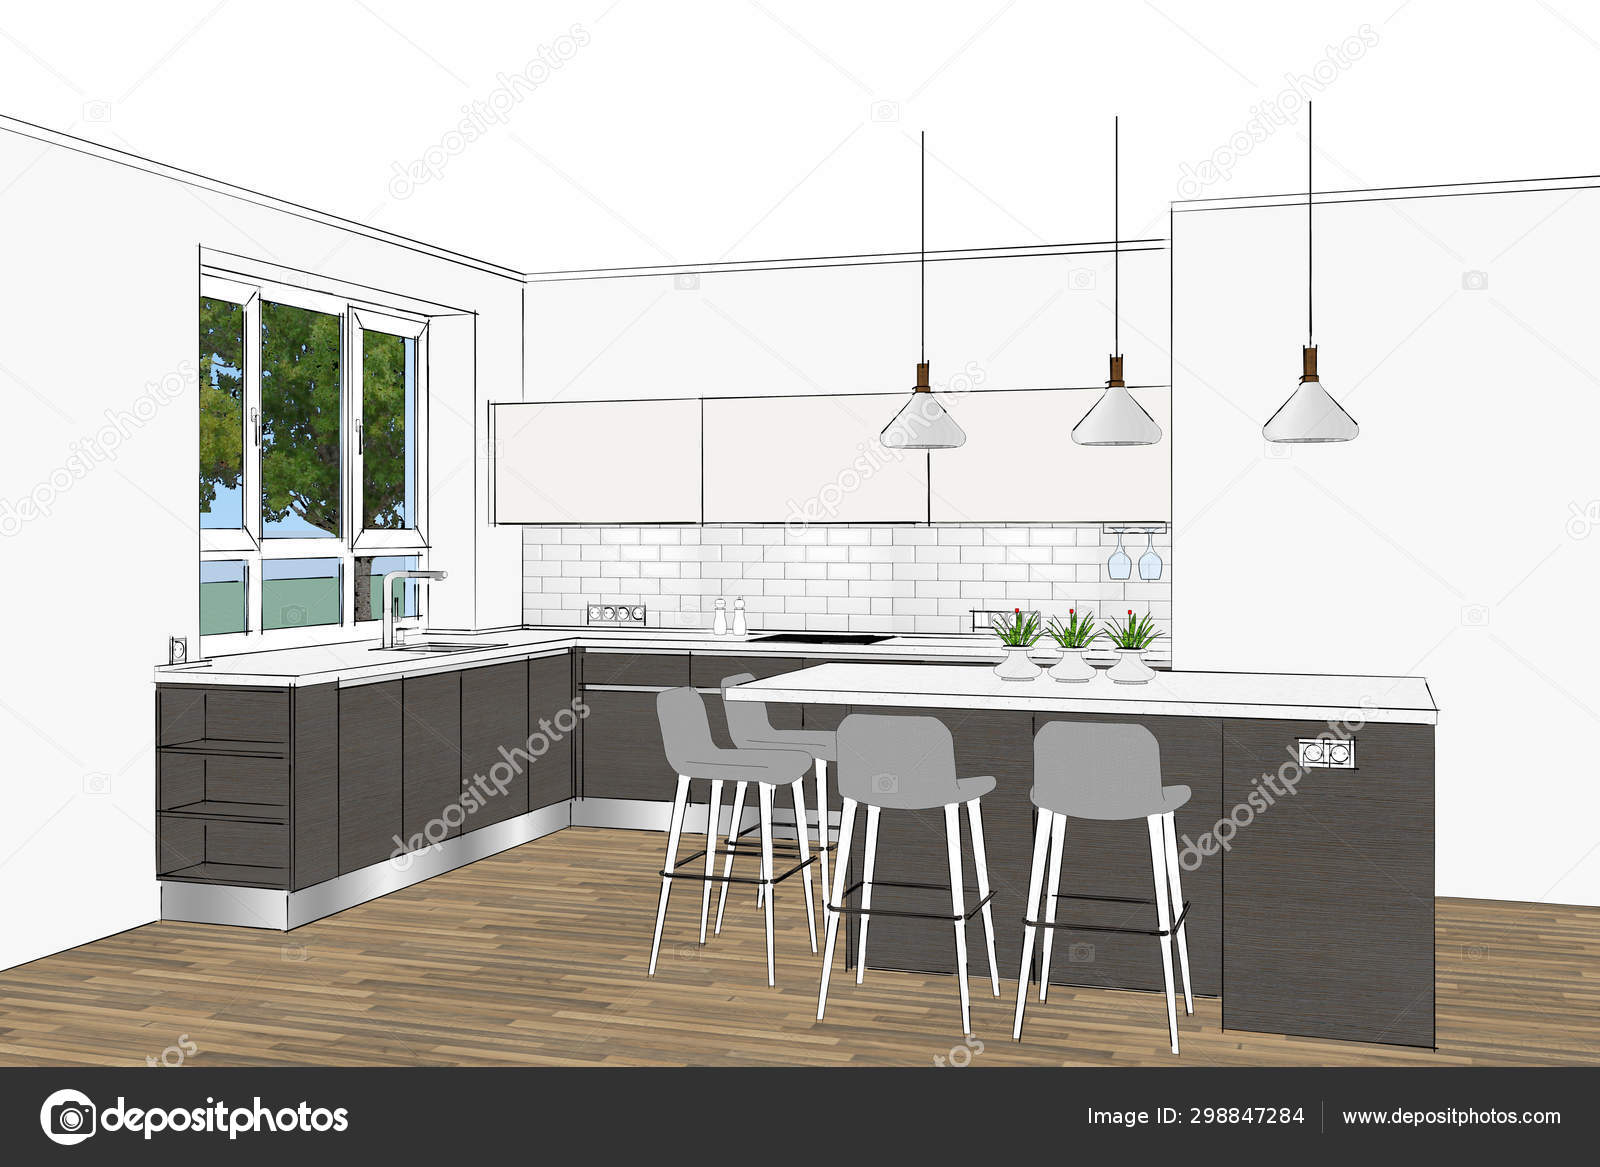 Rendering Modern Scandinavian Kitchen Furniture Design Light Interior Kitchen Island Stock Photo Image By C Richard Salamander 298847284